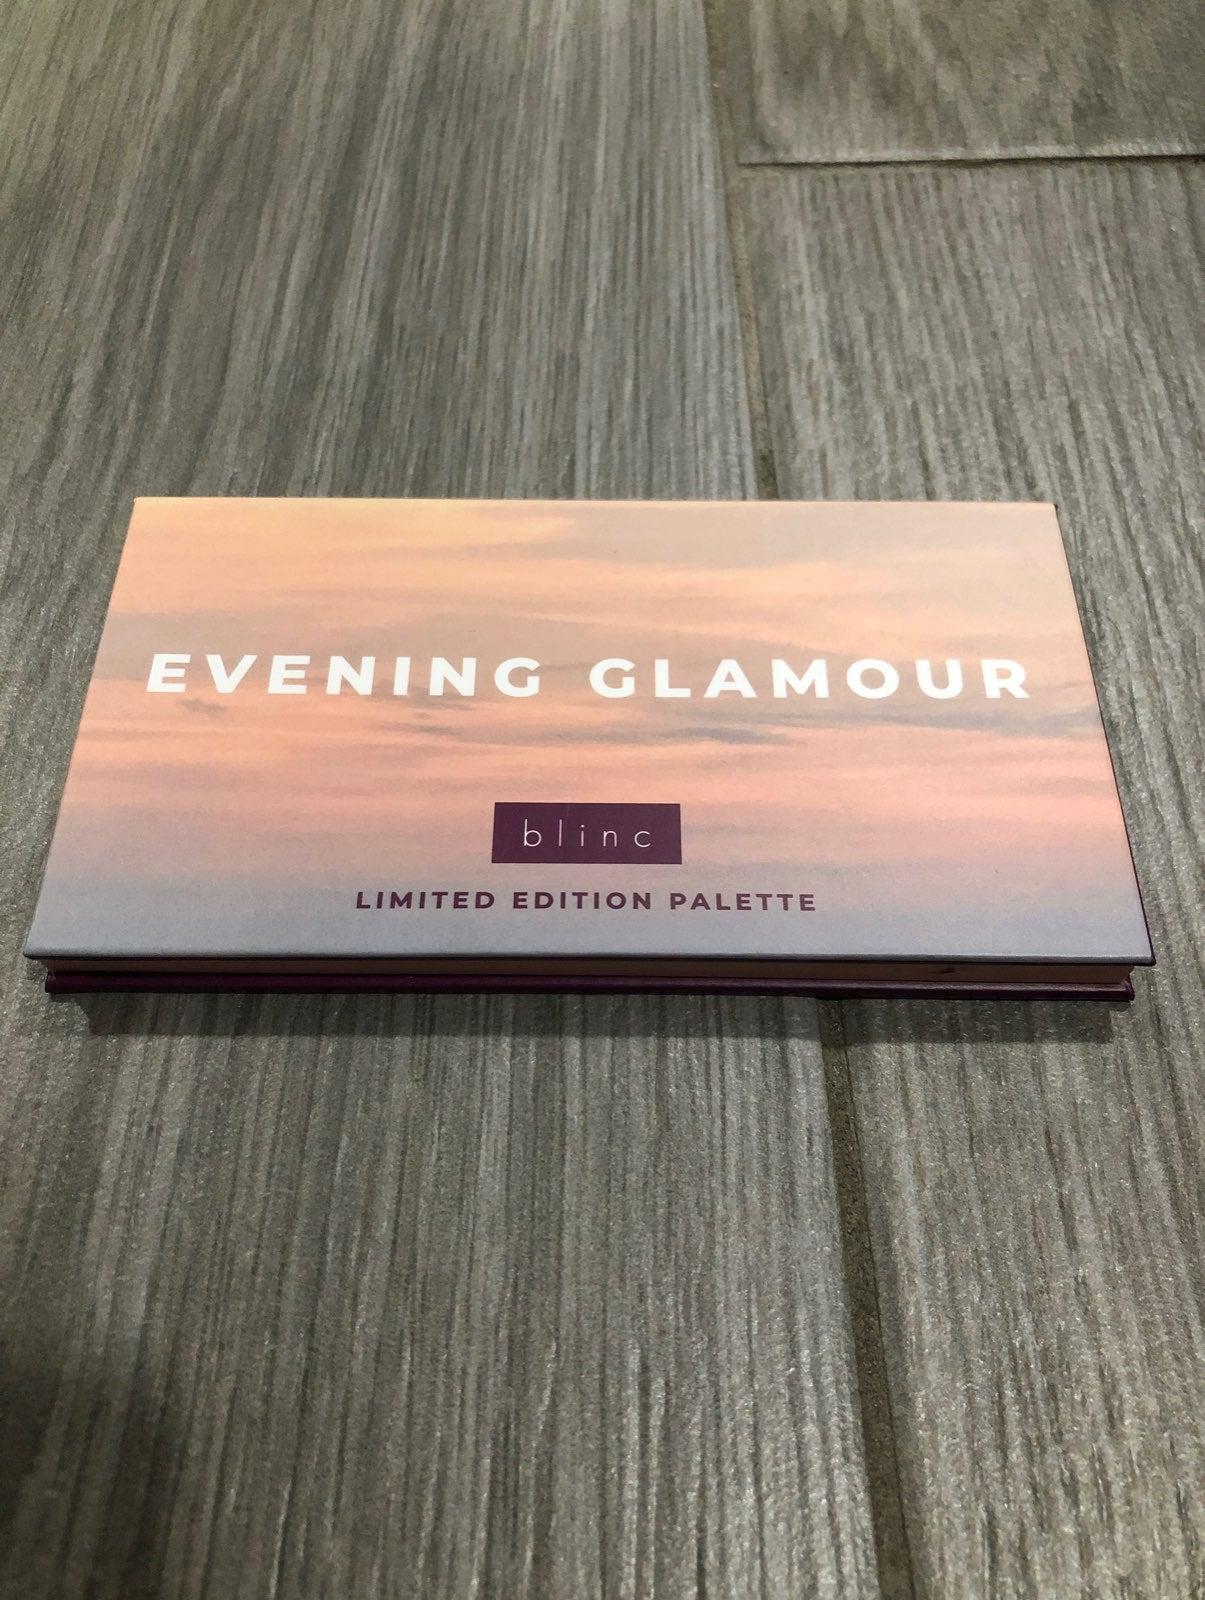 blinc evening glamour eyeshadow palette